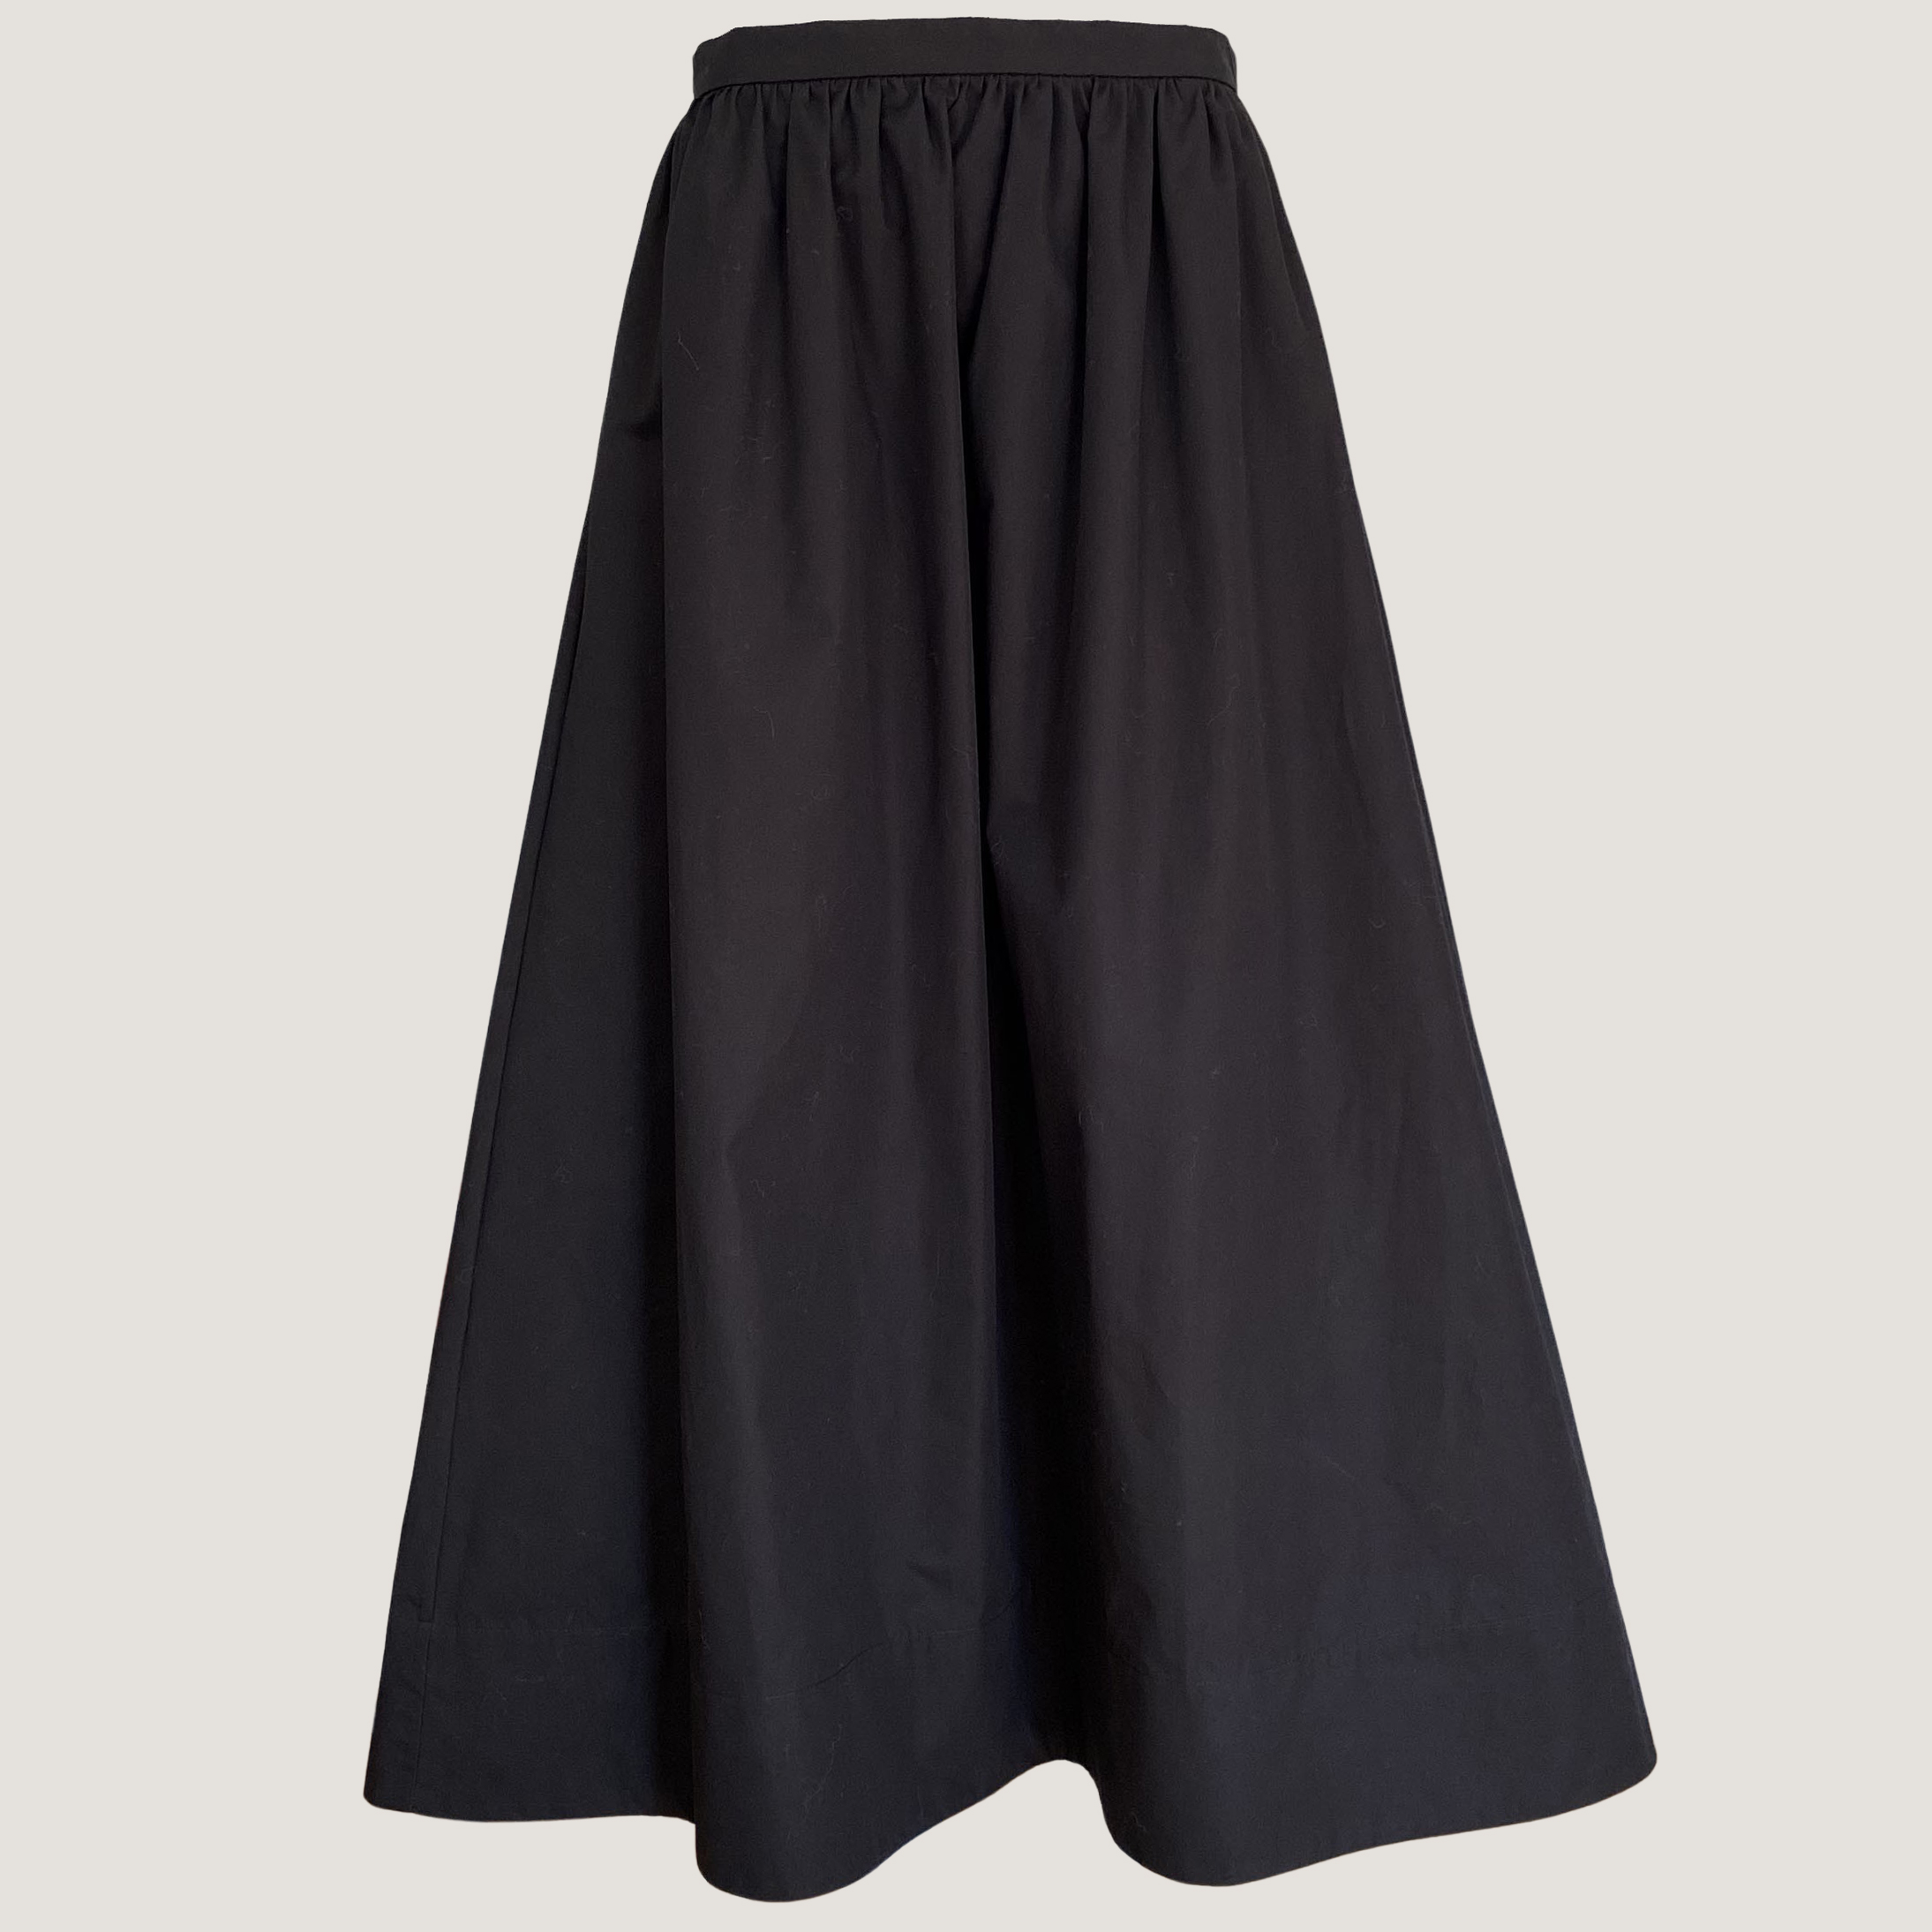 Black Poplin Skirt